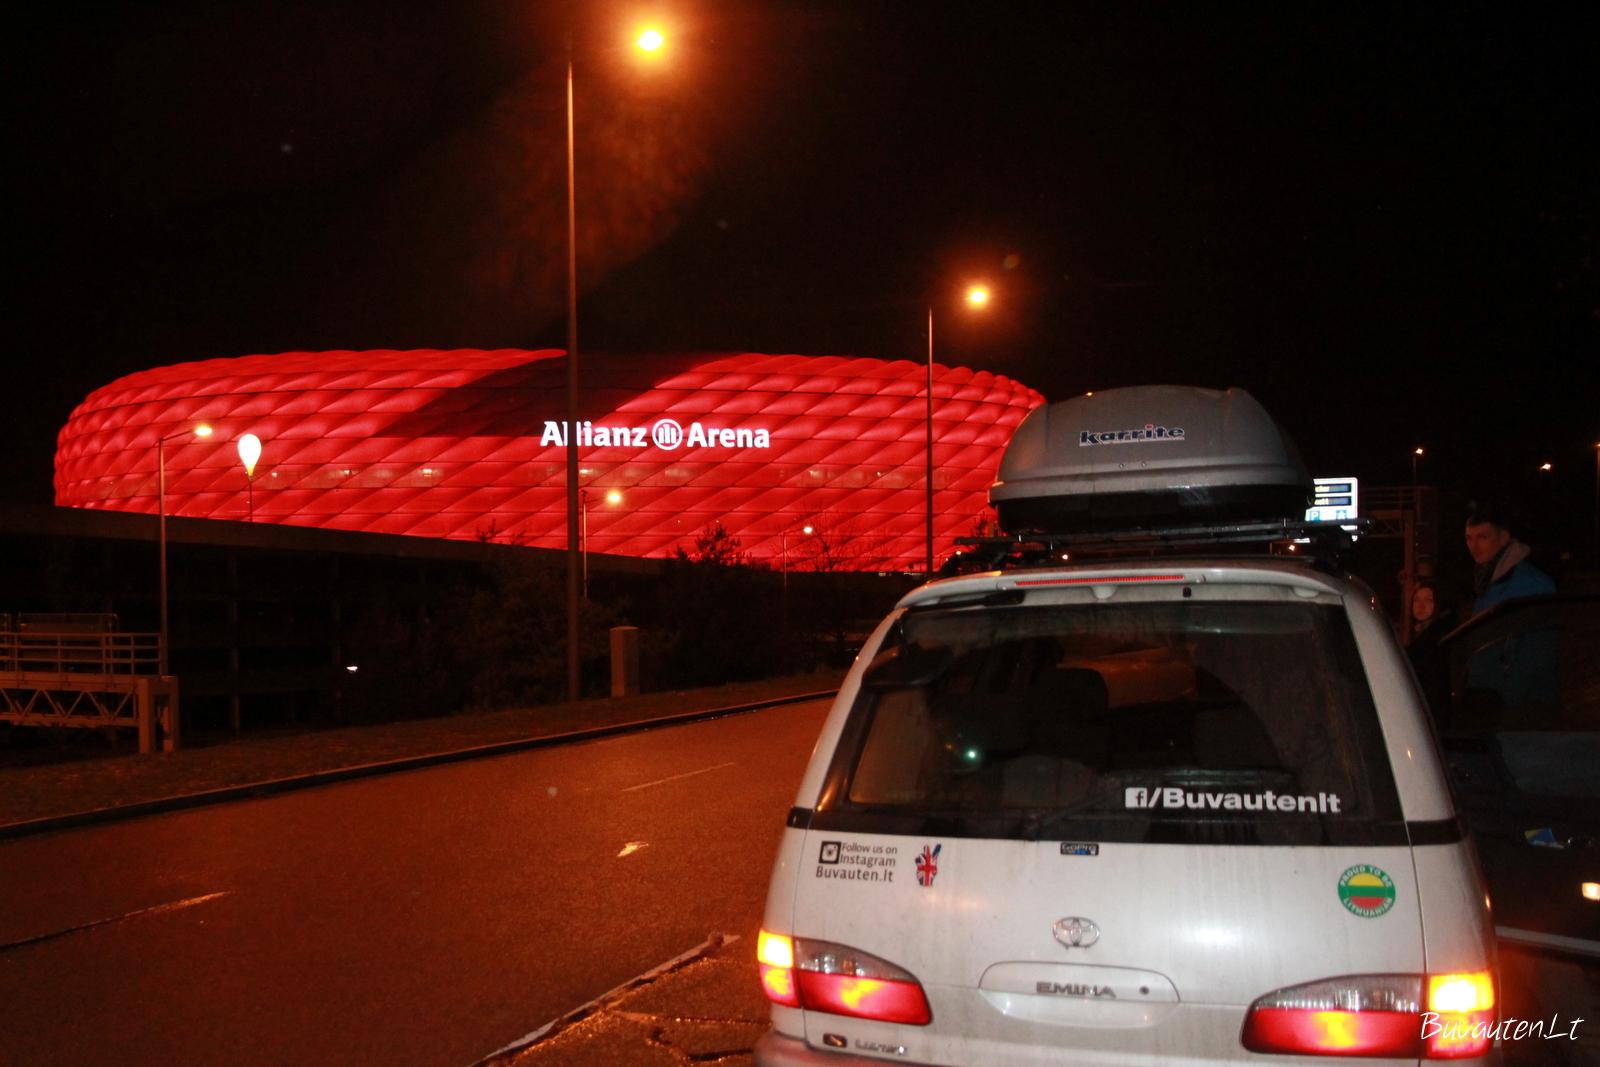 Allianz arena Miunchene